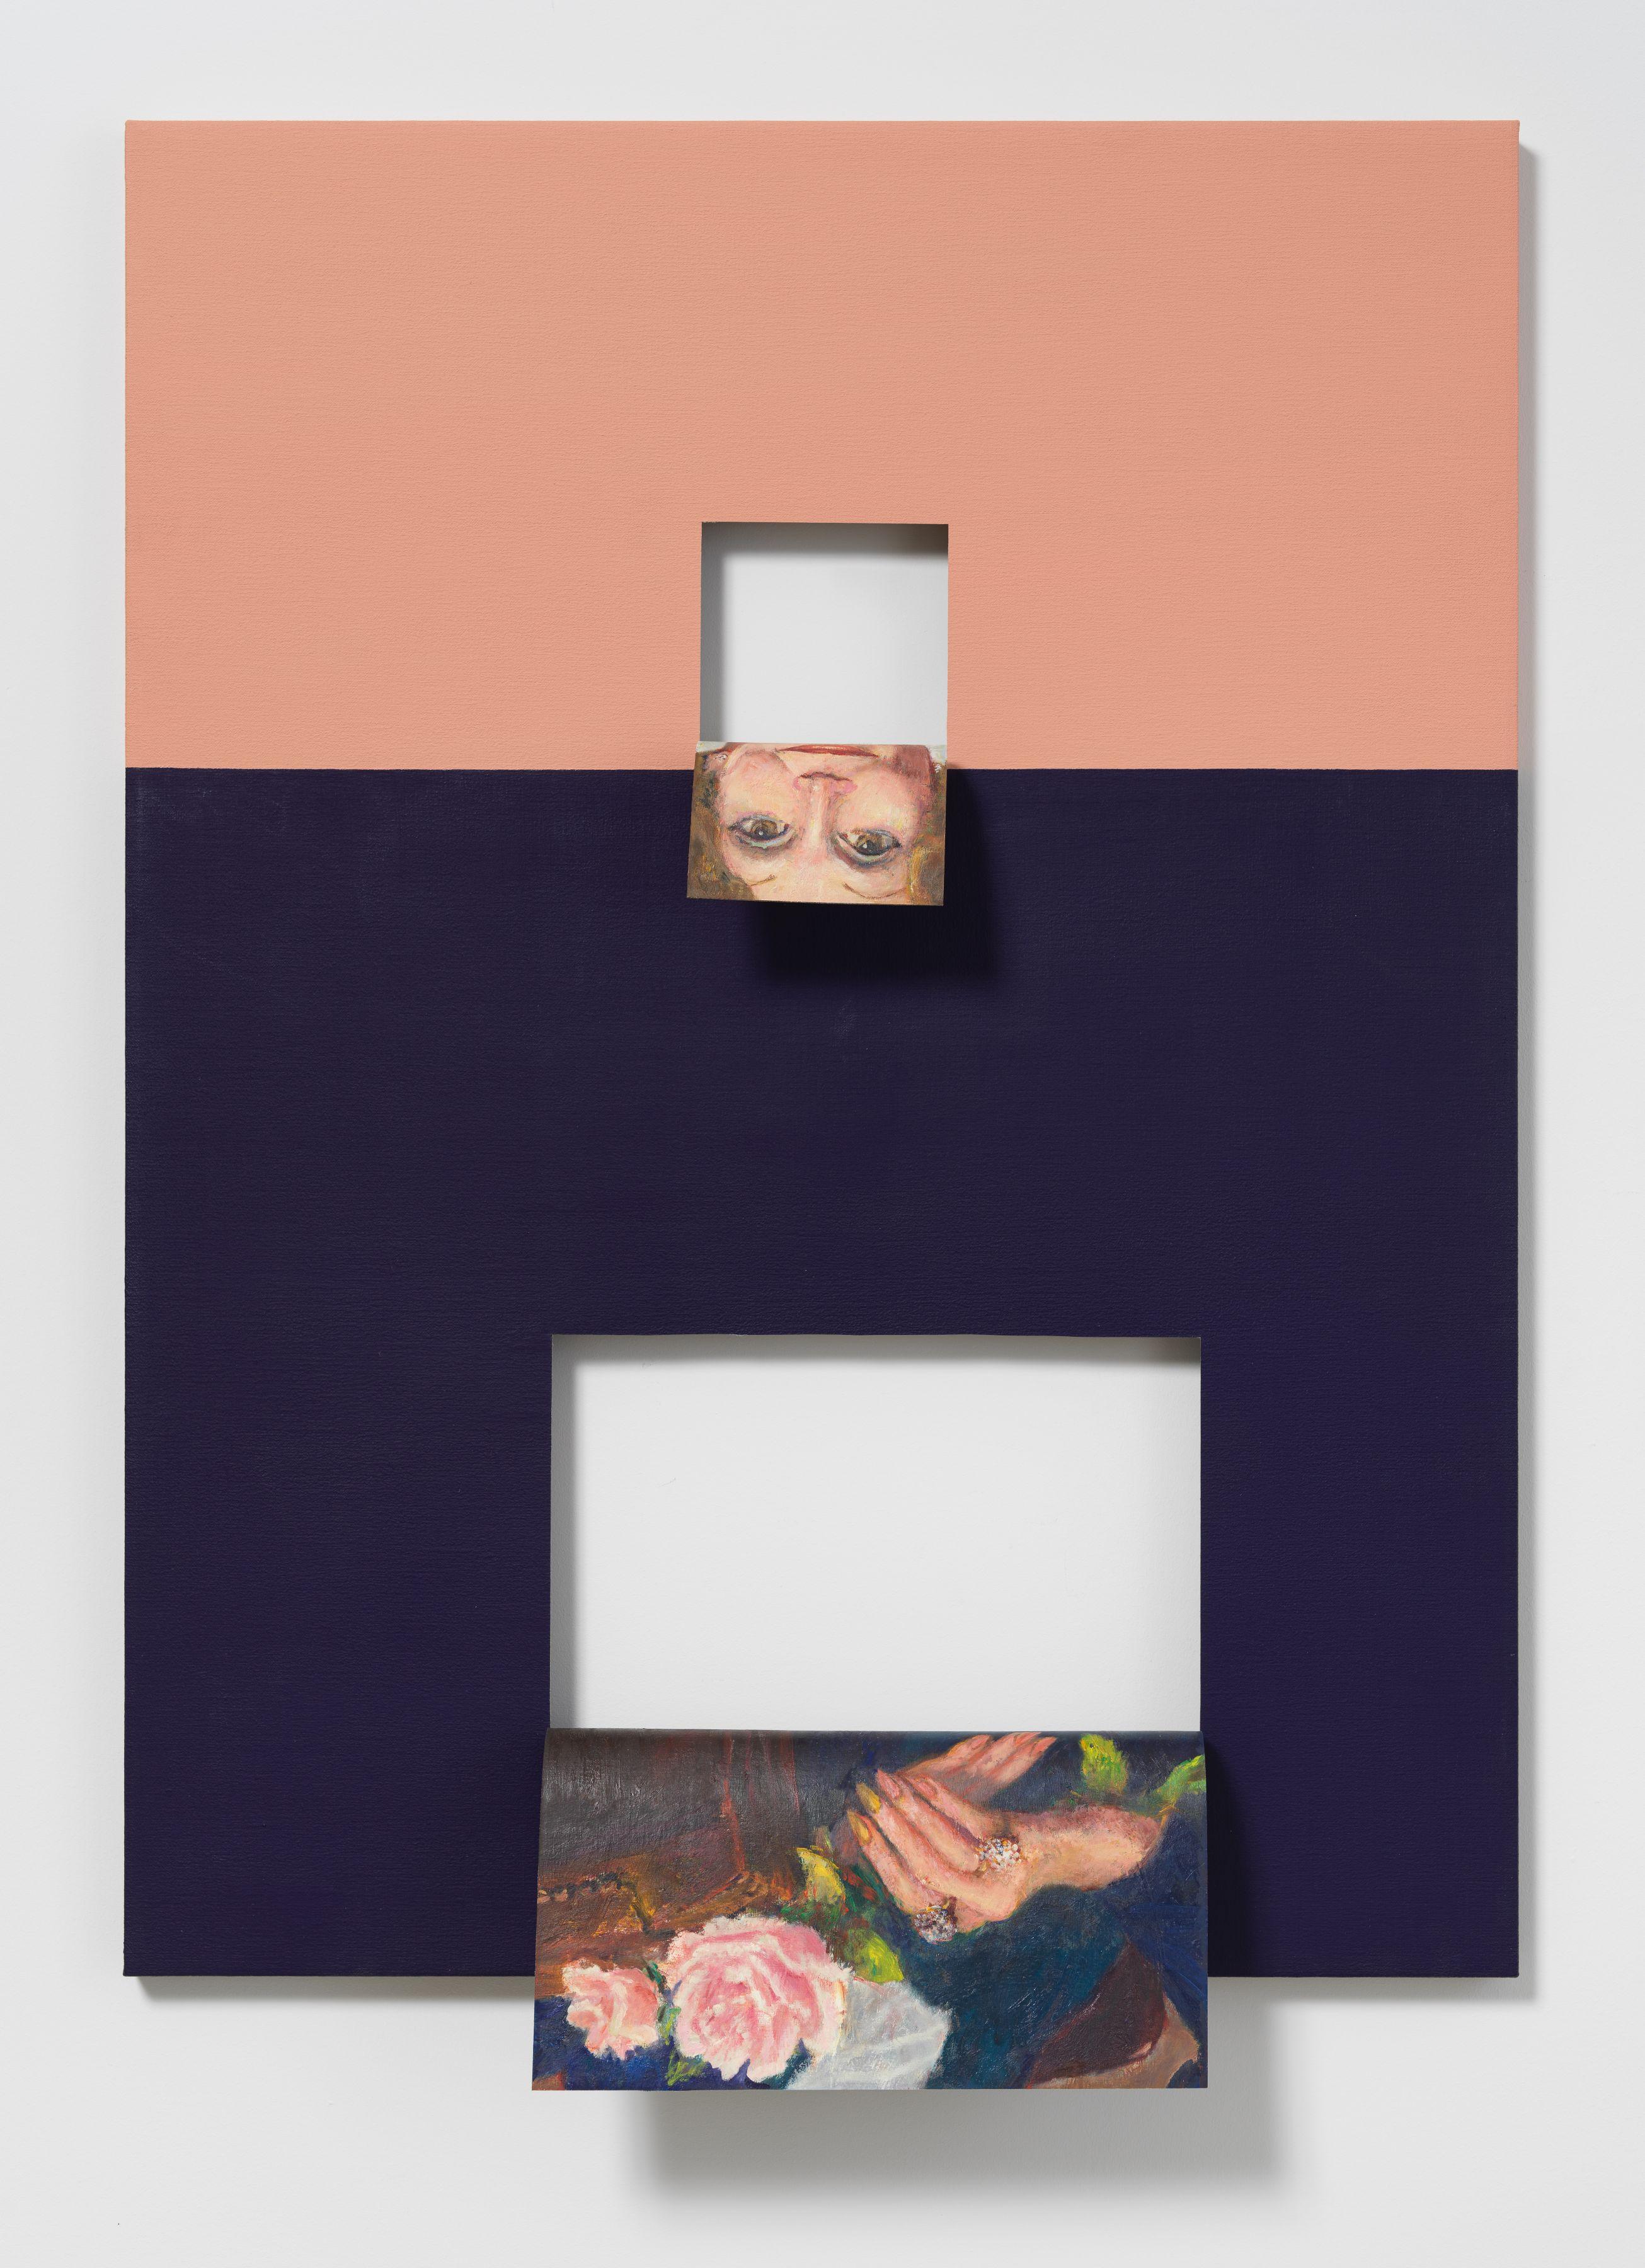 Valeska Soares, Doubleface (Permanent Rose/Ultramarine Blue-Phthalo Blue), 2019